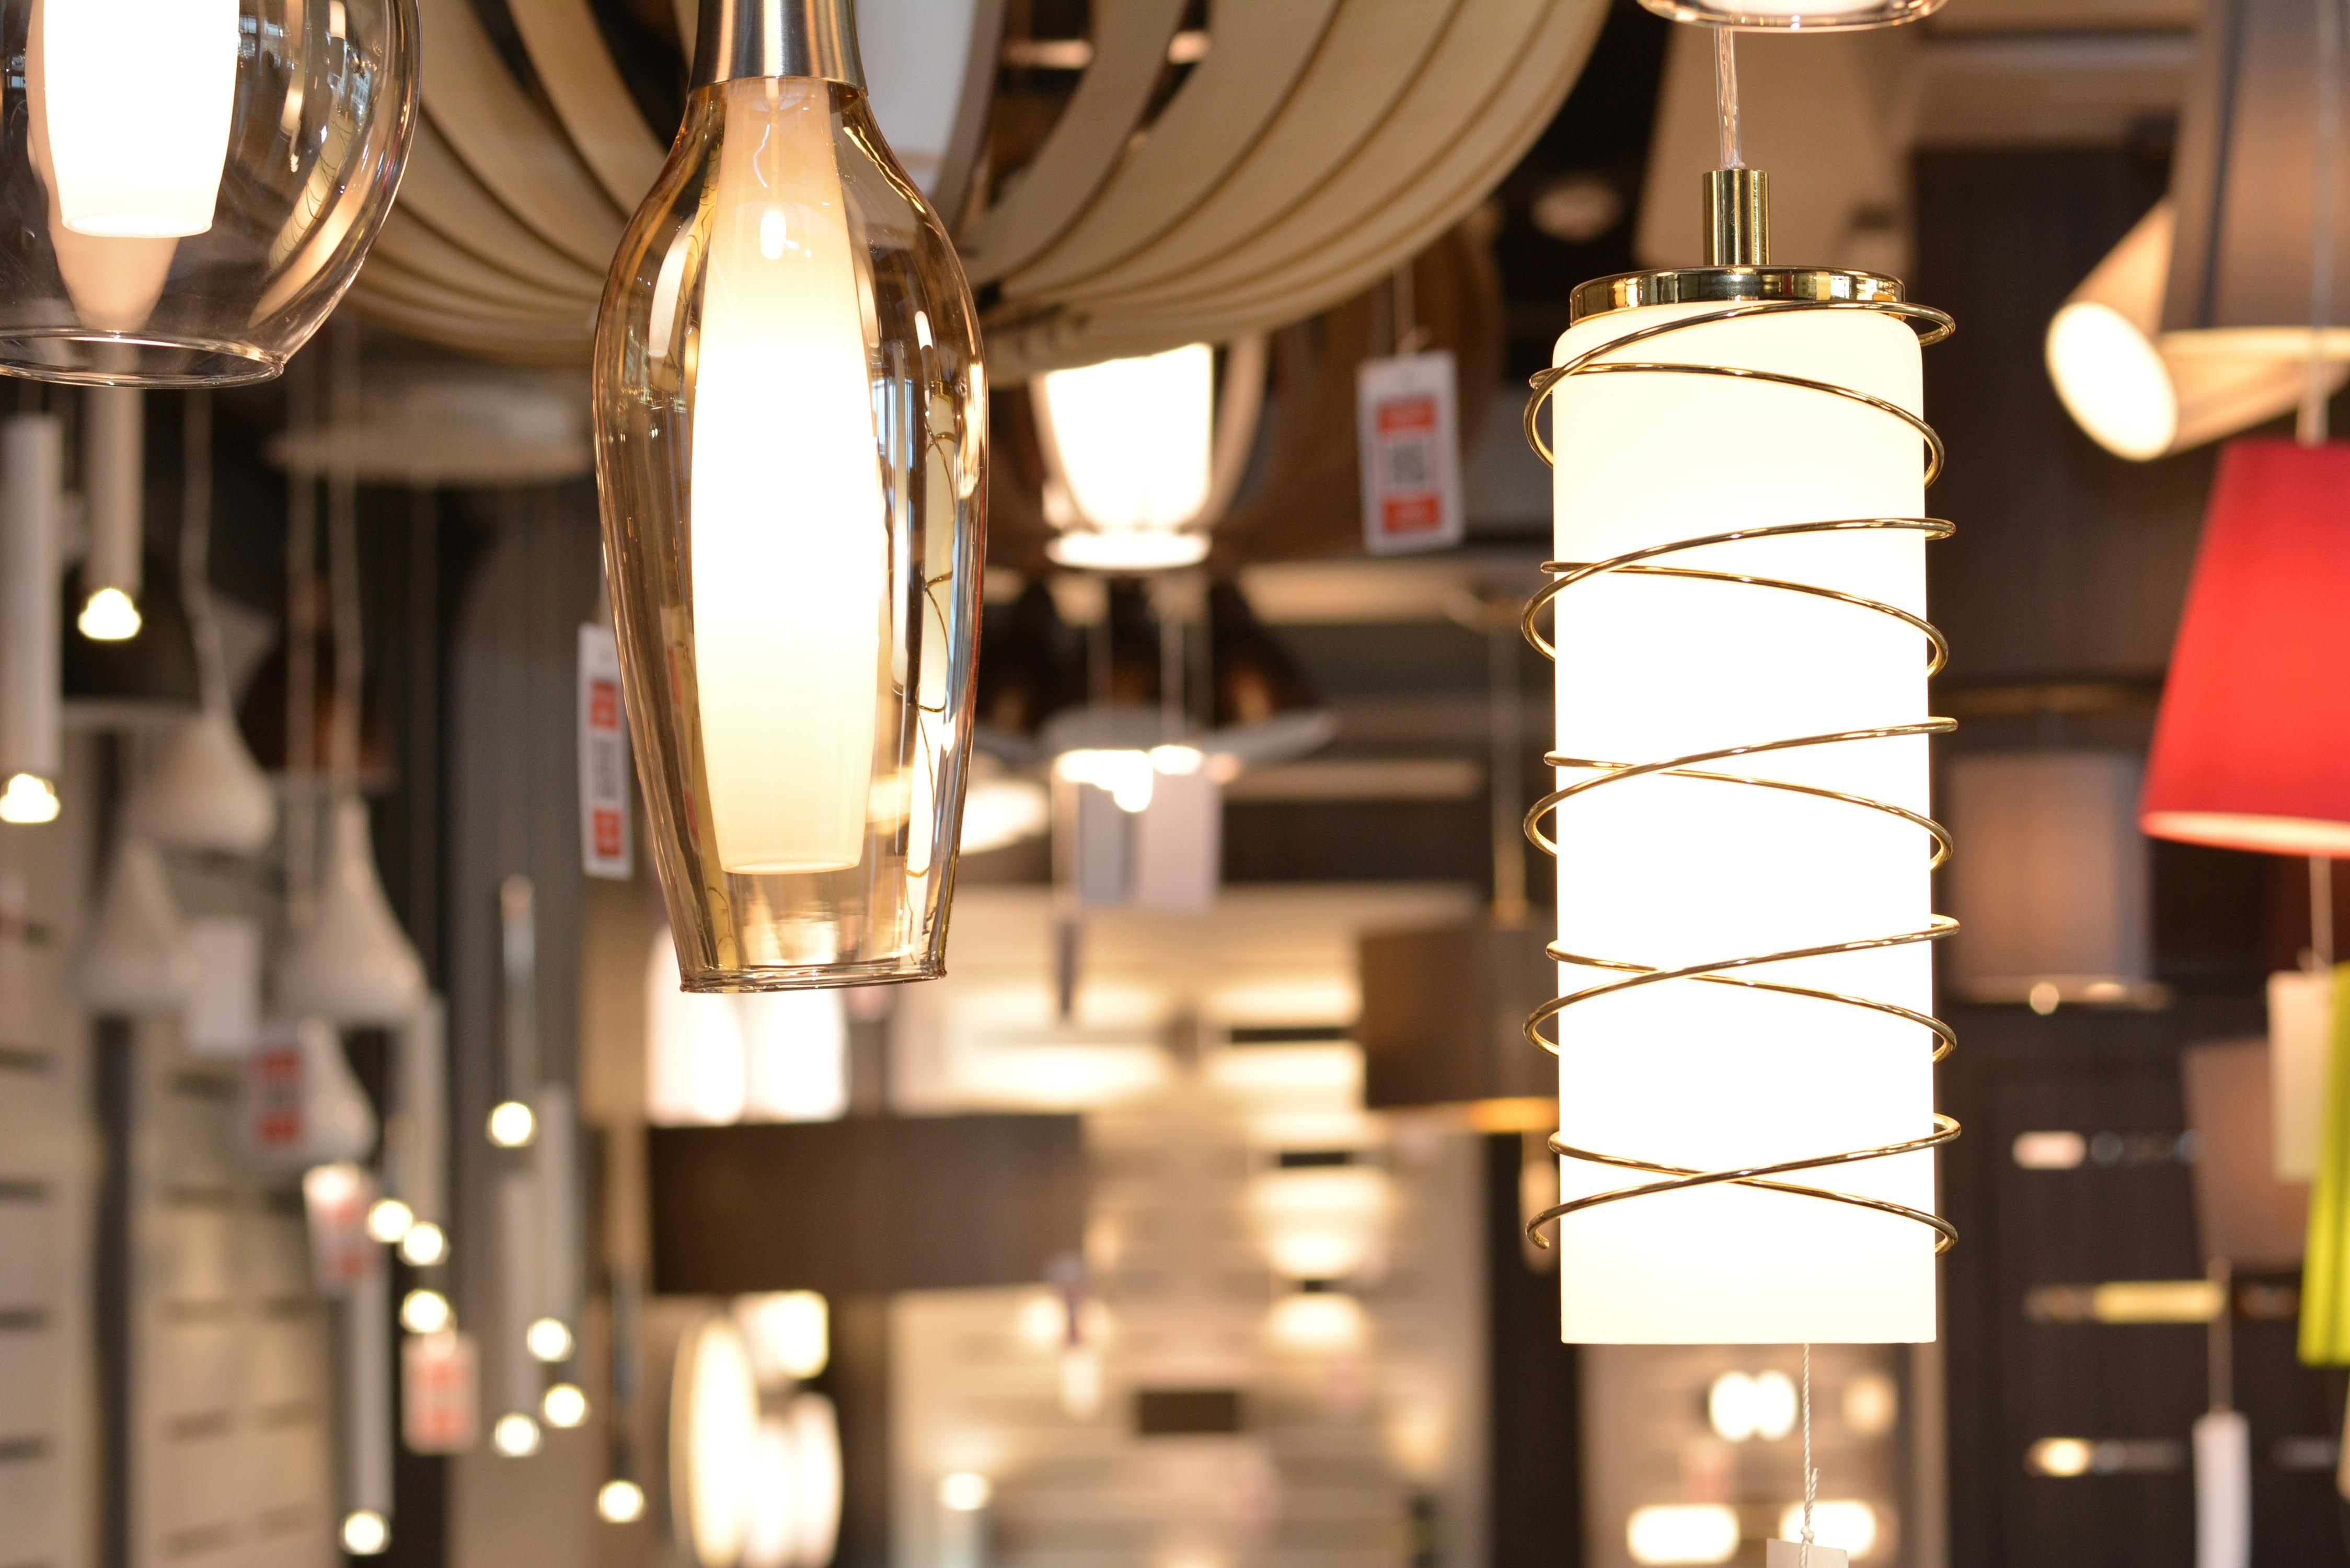 متجر الإضاءة في دبي شراء اضاءة اون لاين Elettrico In Dubai Recessed Lighting Fixtures Contemporary Light Fixtures Creative Interior Design